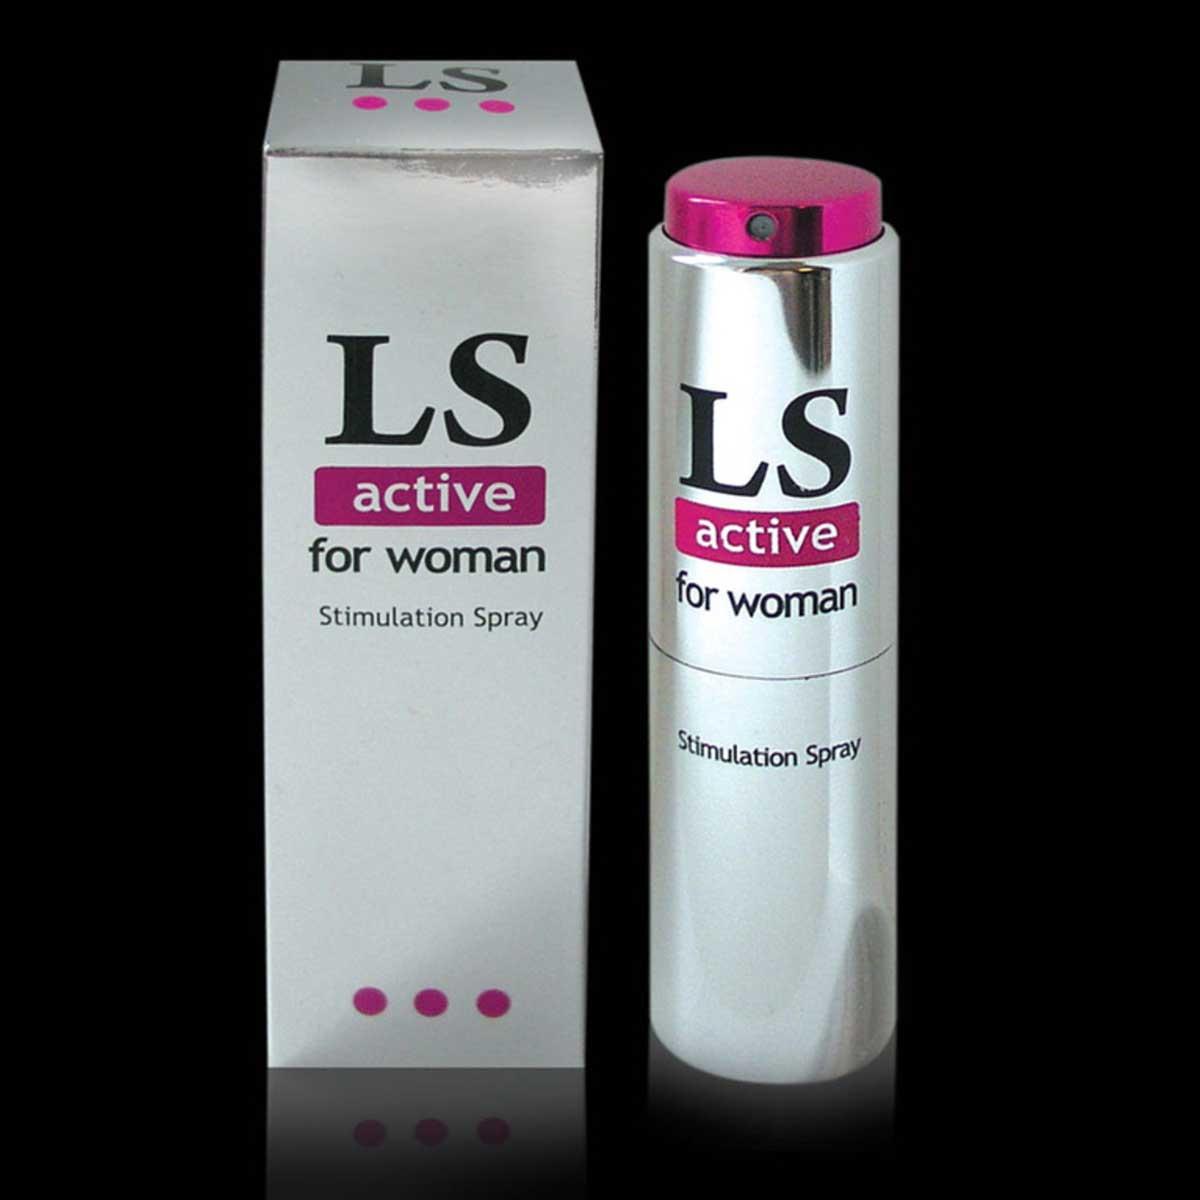 Спрей-стимулятор для женщин Lovespray Active Woman - 18 мл. - фото 134056